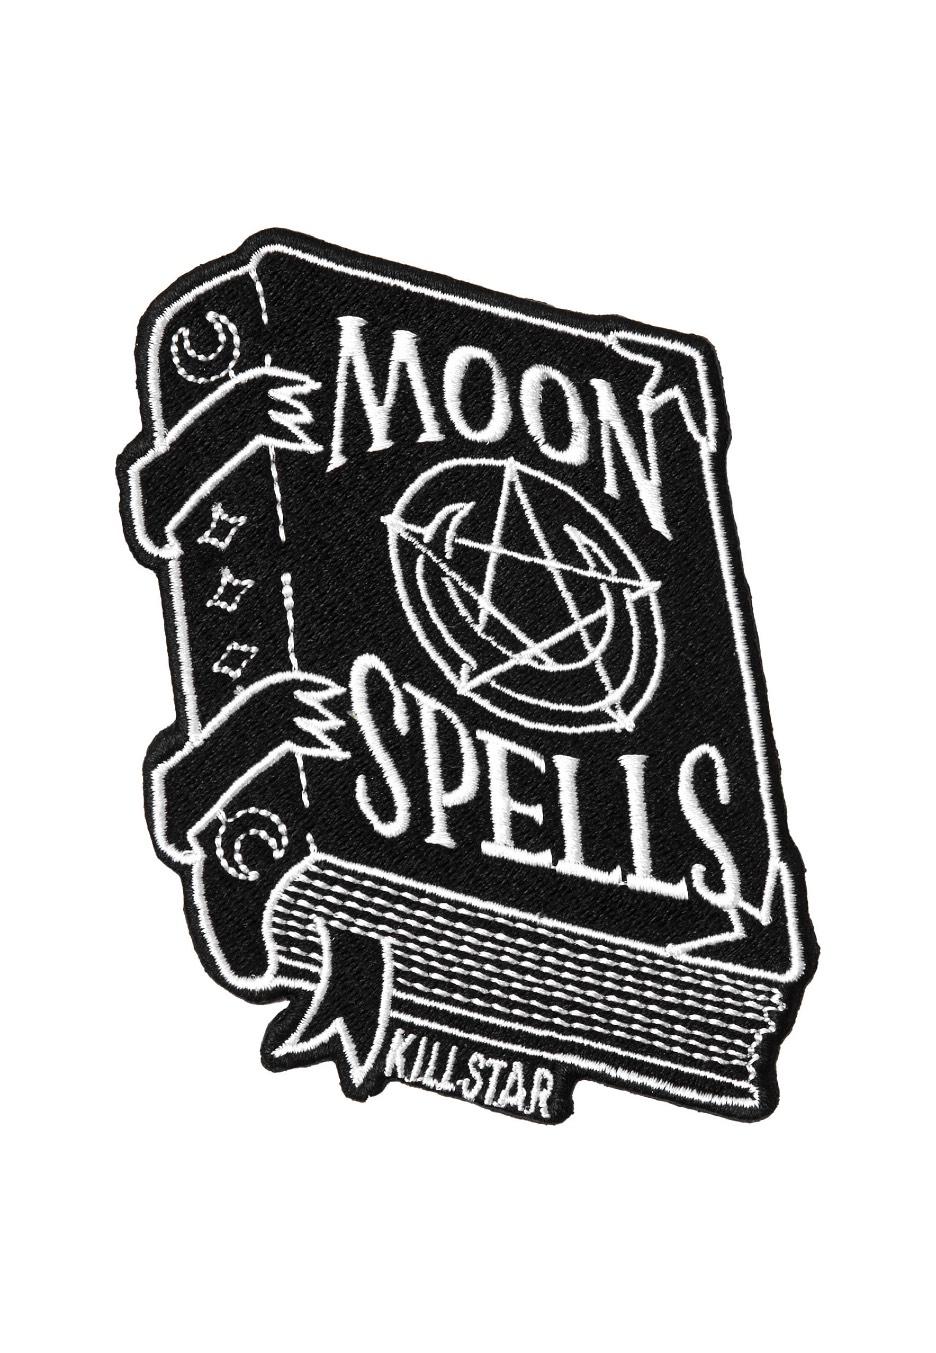 Killstar - Moon Spells Black - Patch - Streetwear Shop - Impericon.com  Worldwide efc9b940918b2